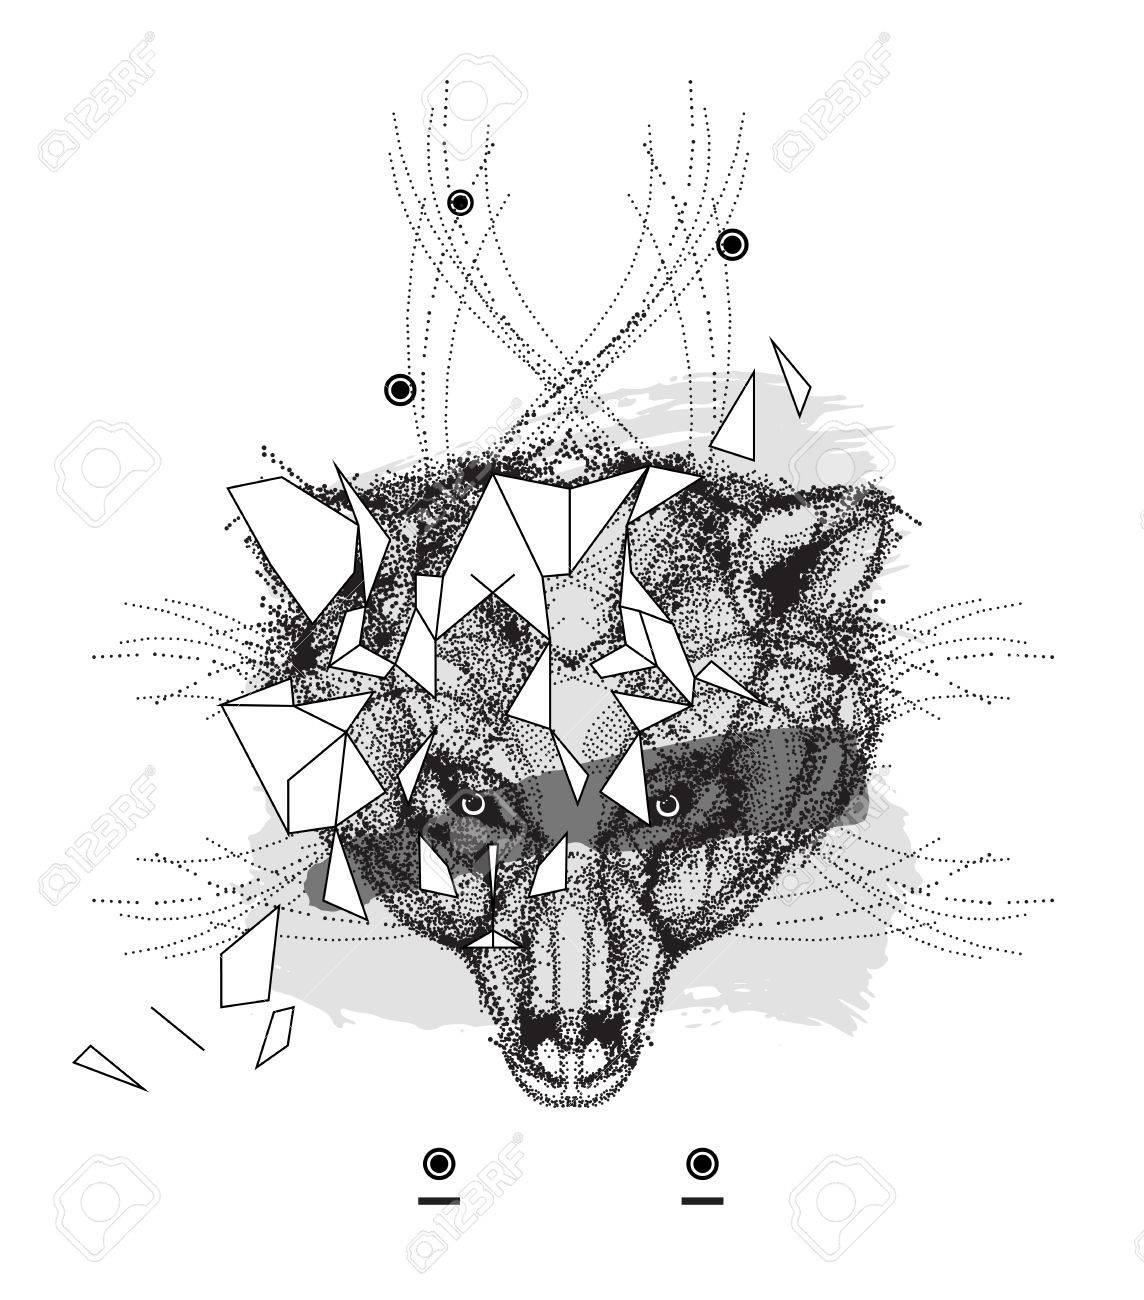 Cabeza De Oso Animal Icono Triangular, Diseño De La Línea De Moda ...